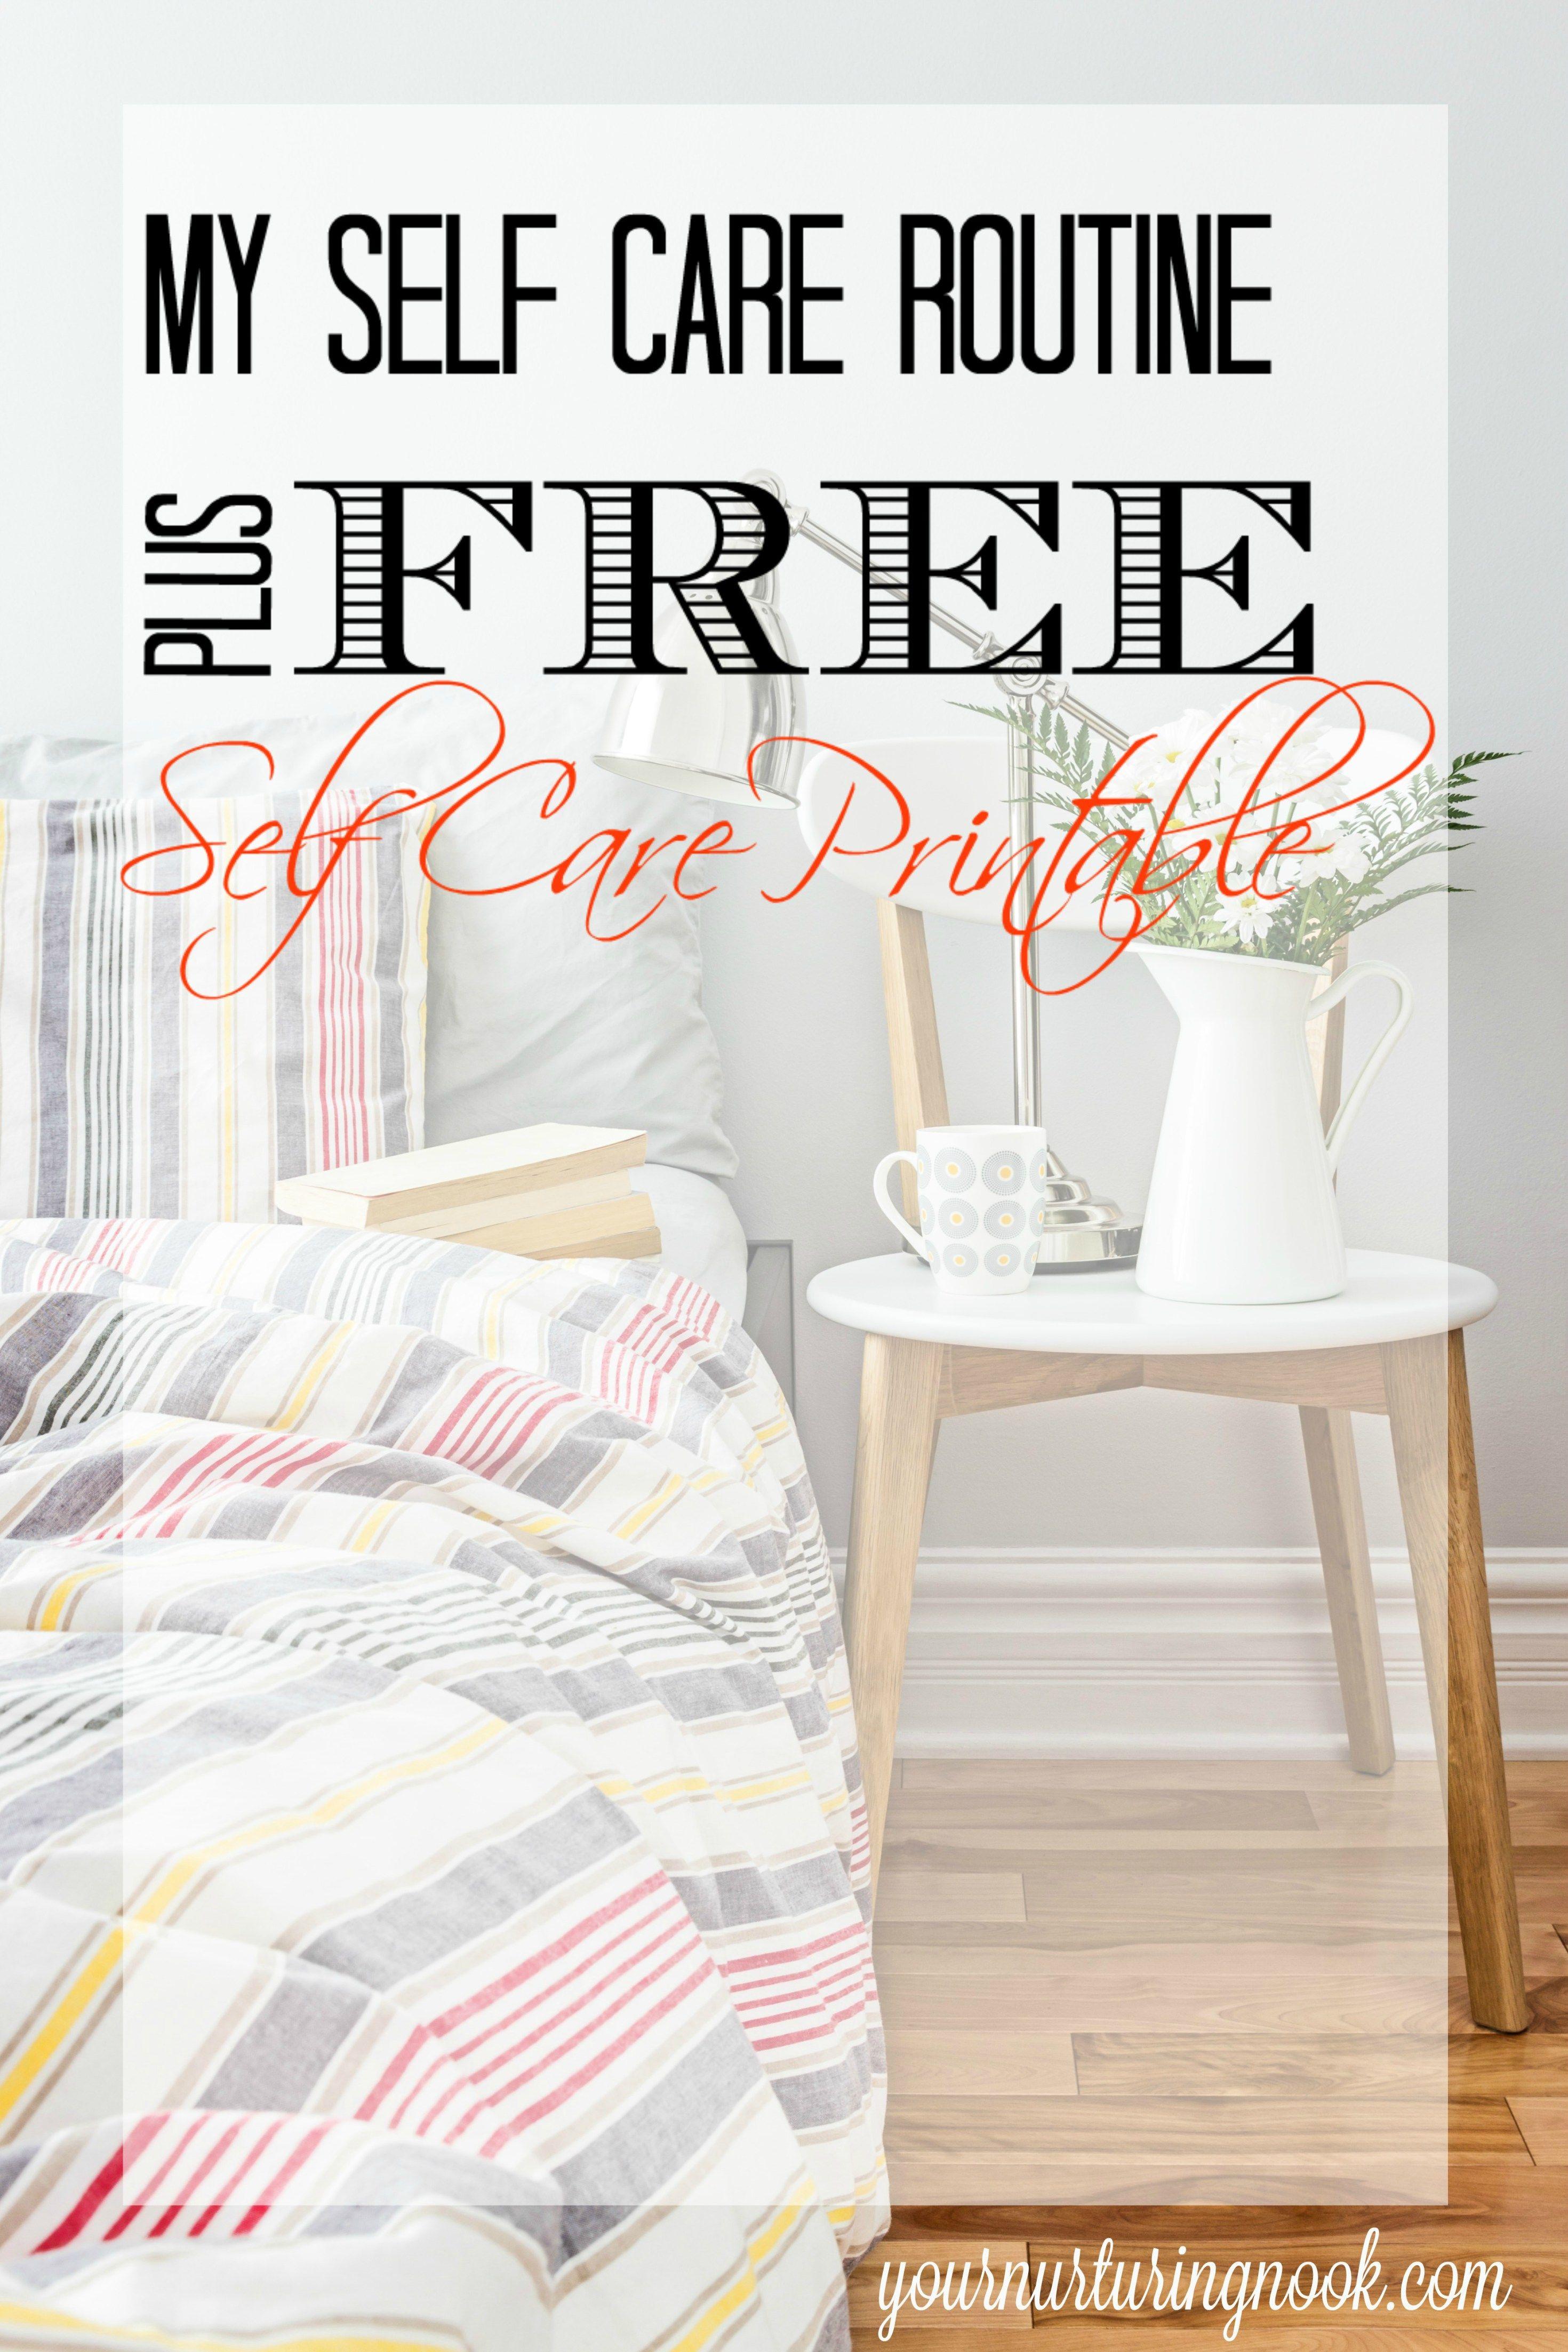 My Self Care Plan Free Self Care Printable